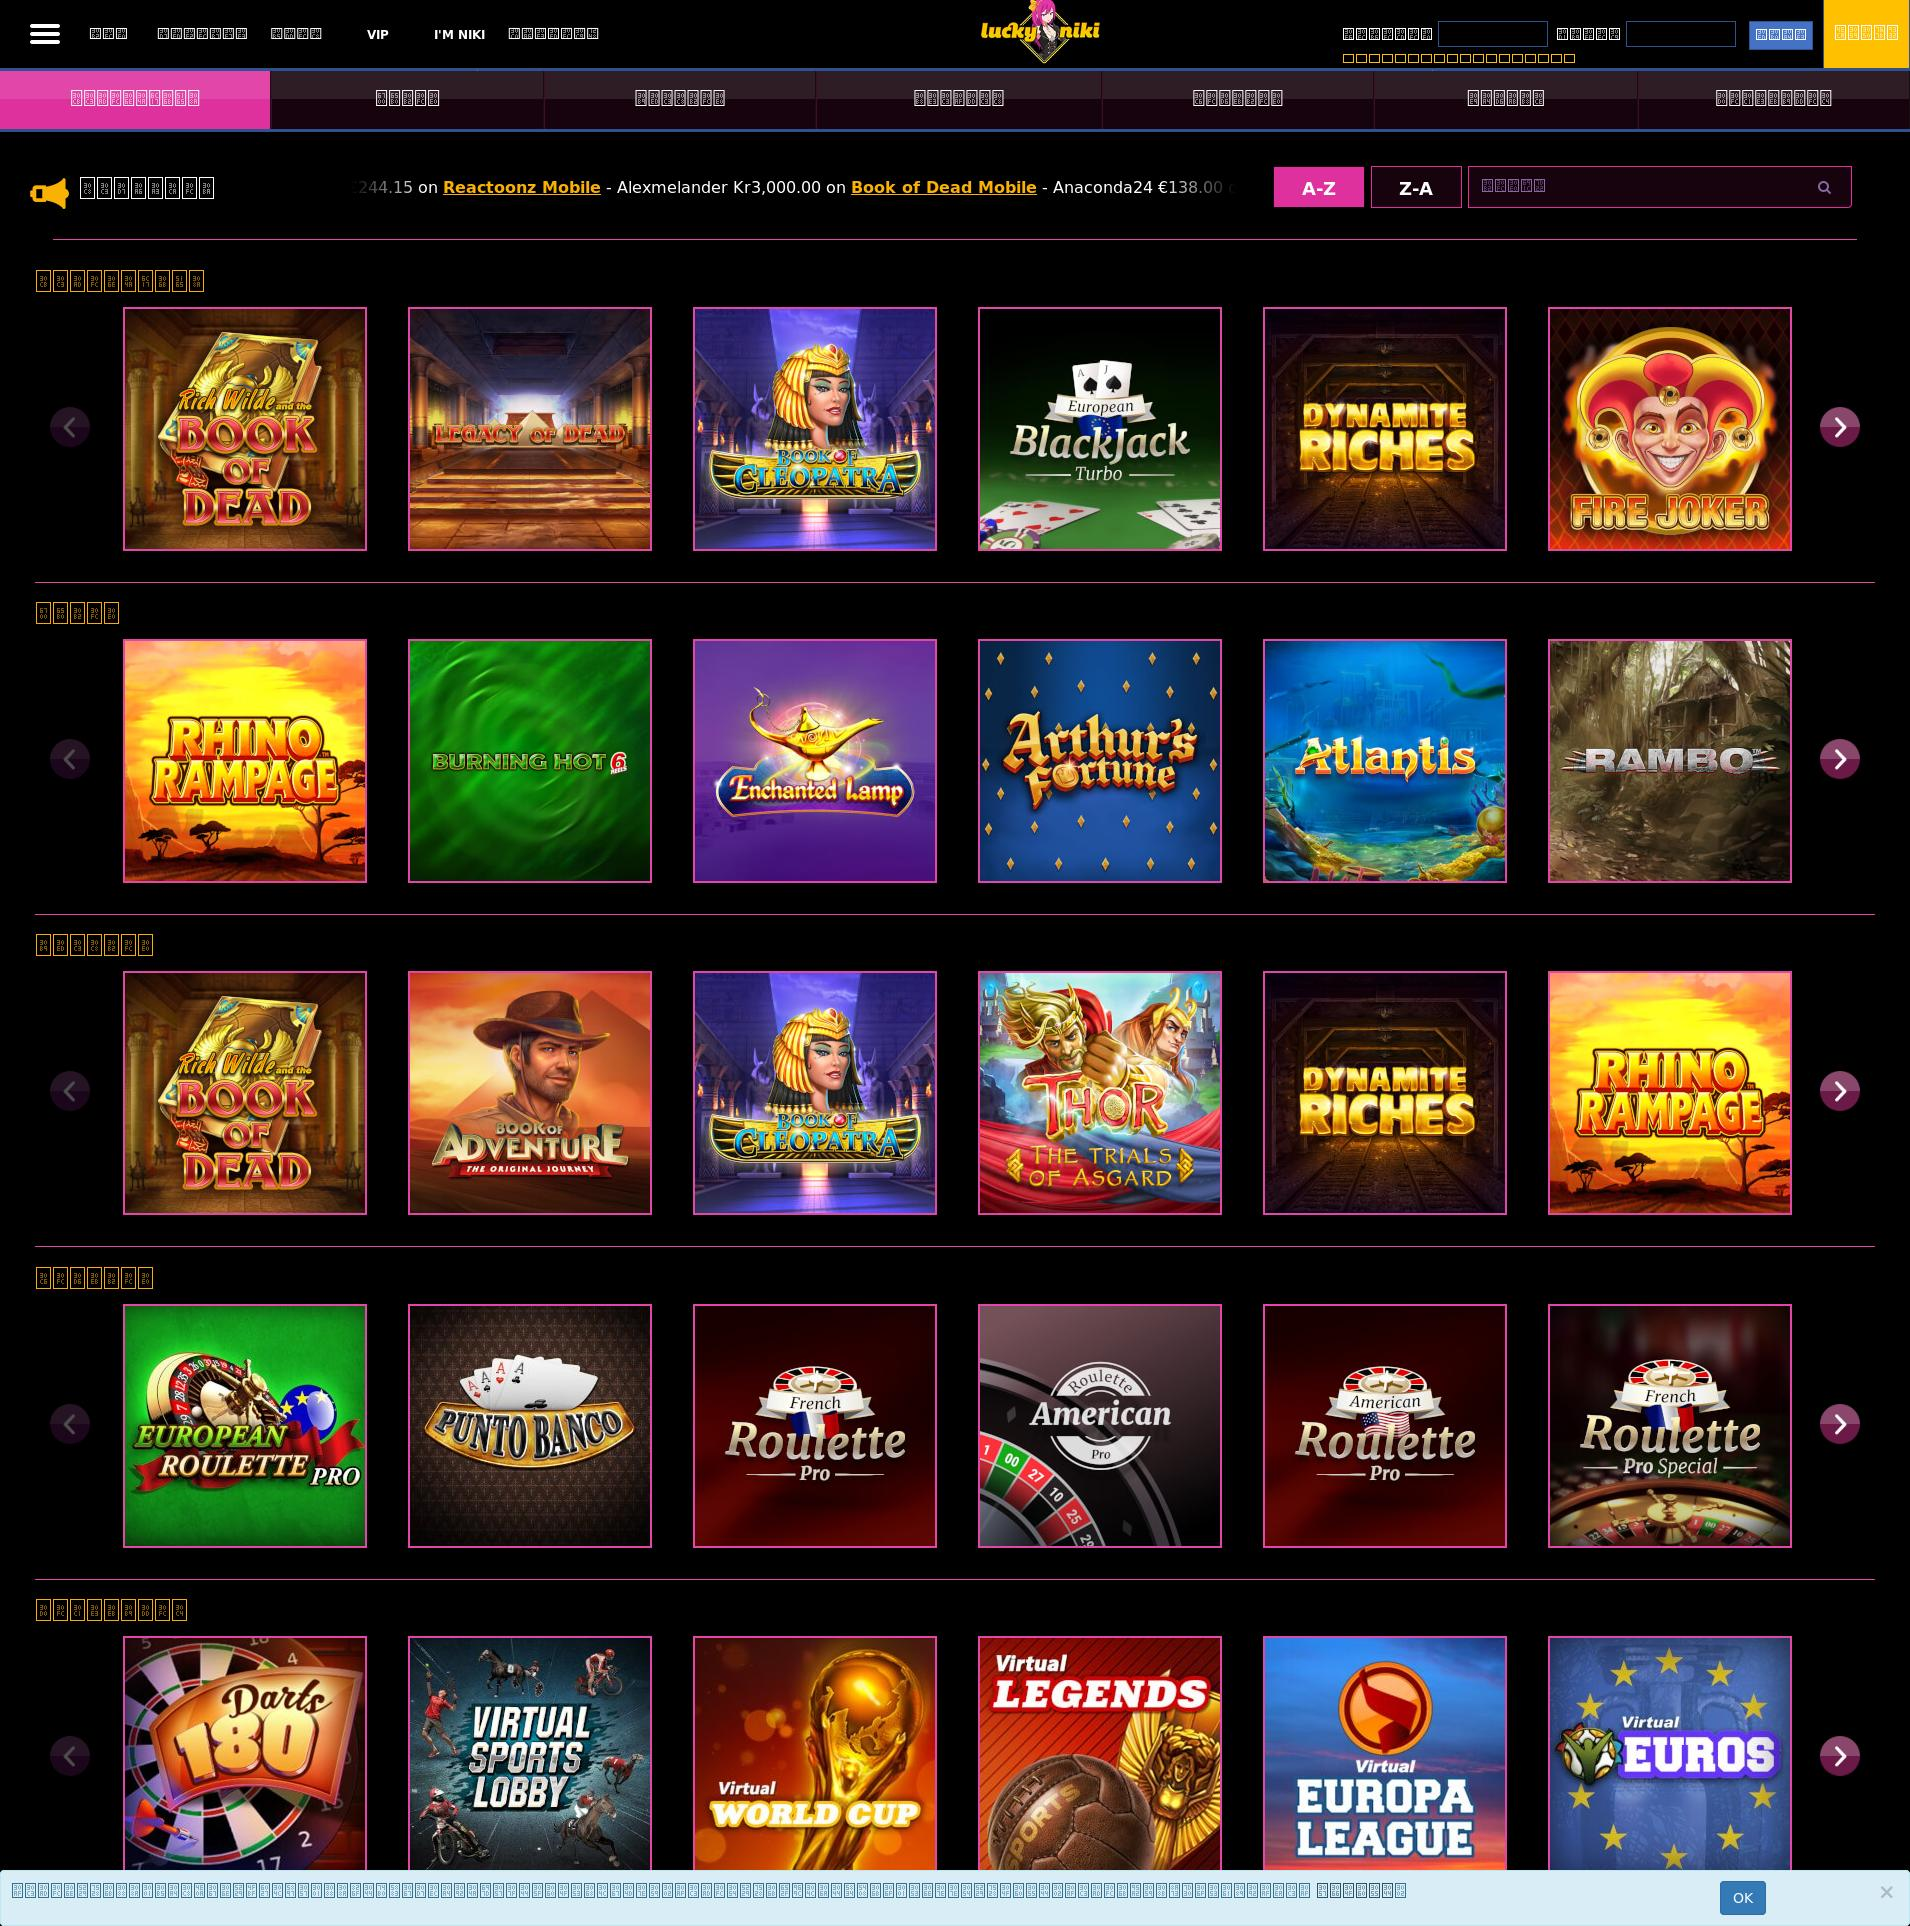 Casino screen Lobby 2020-05-30 for Japan